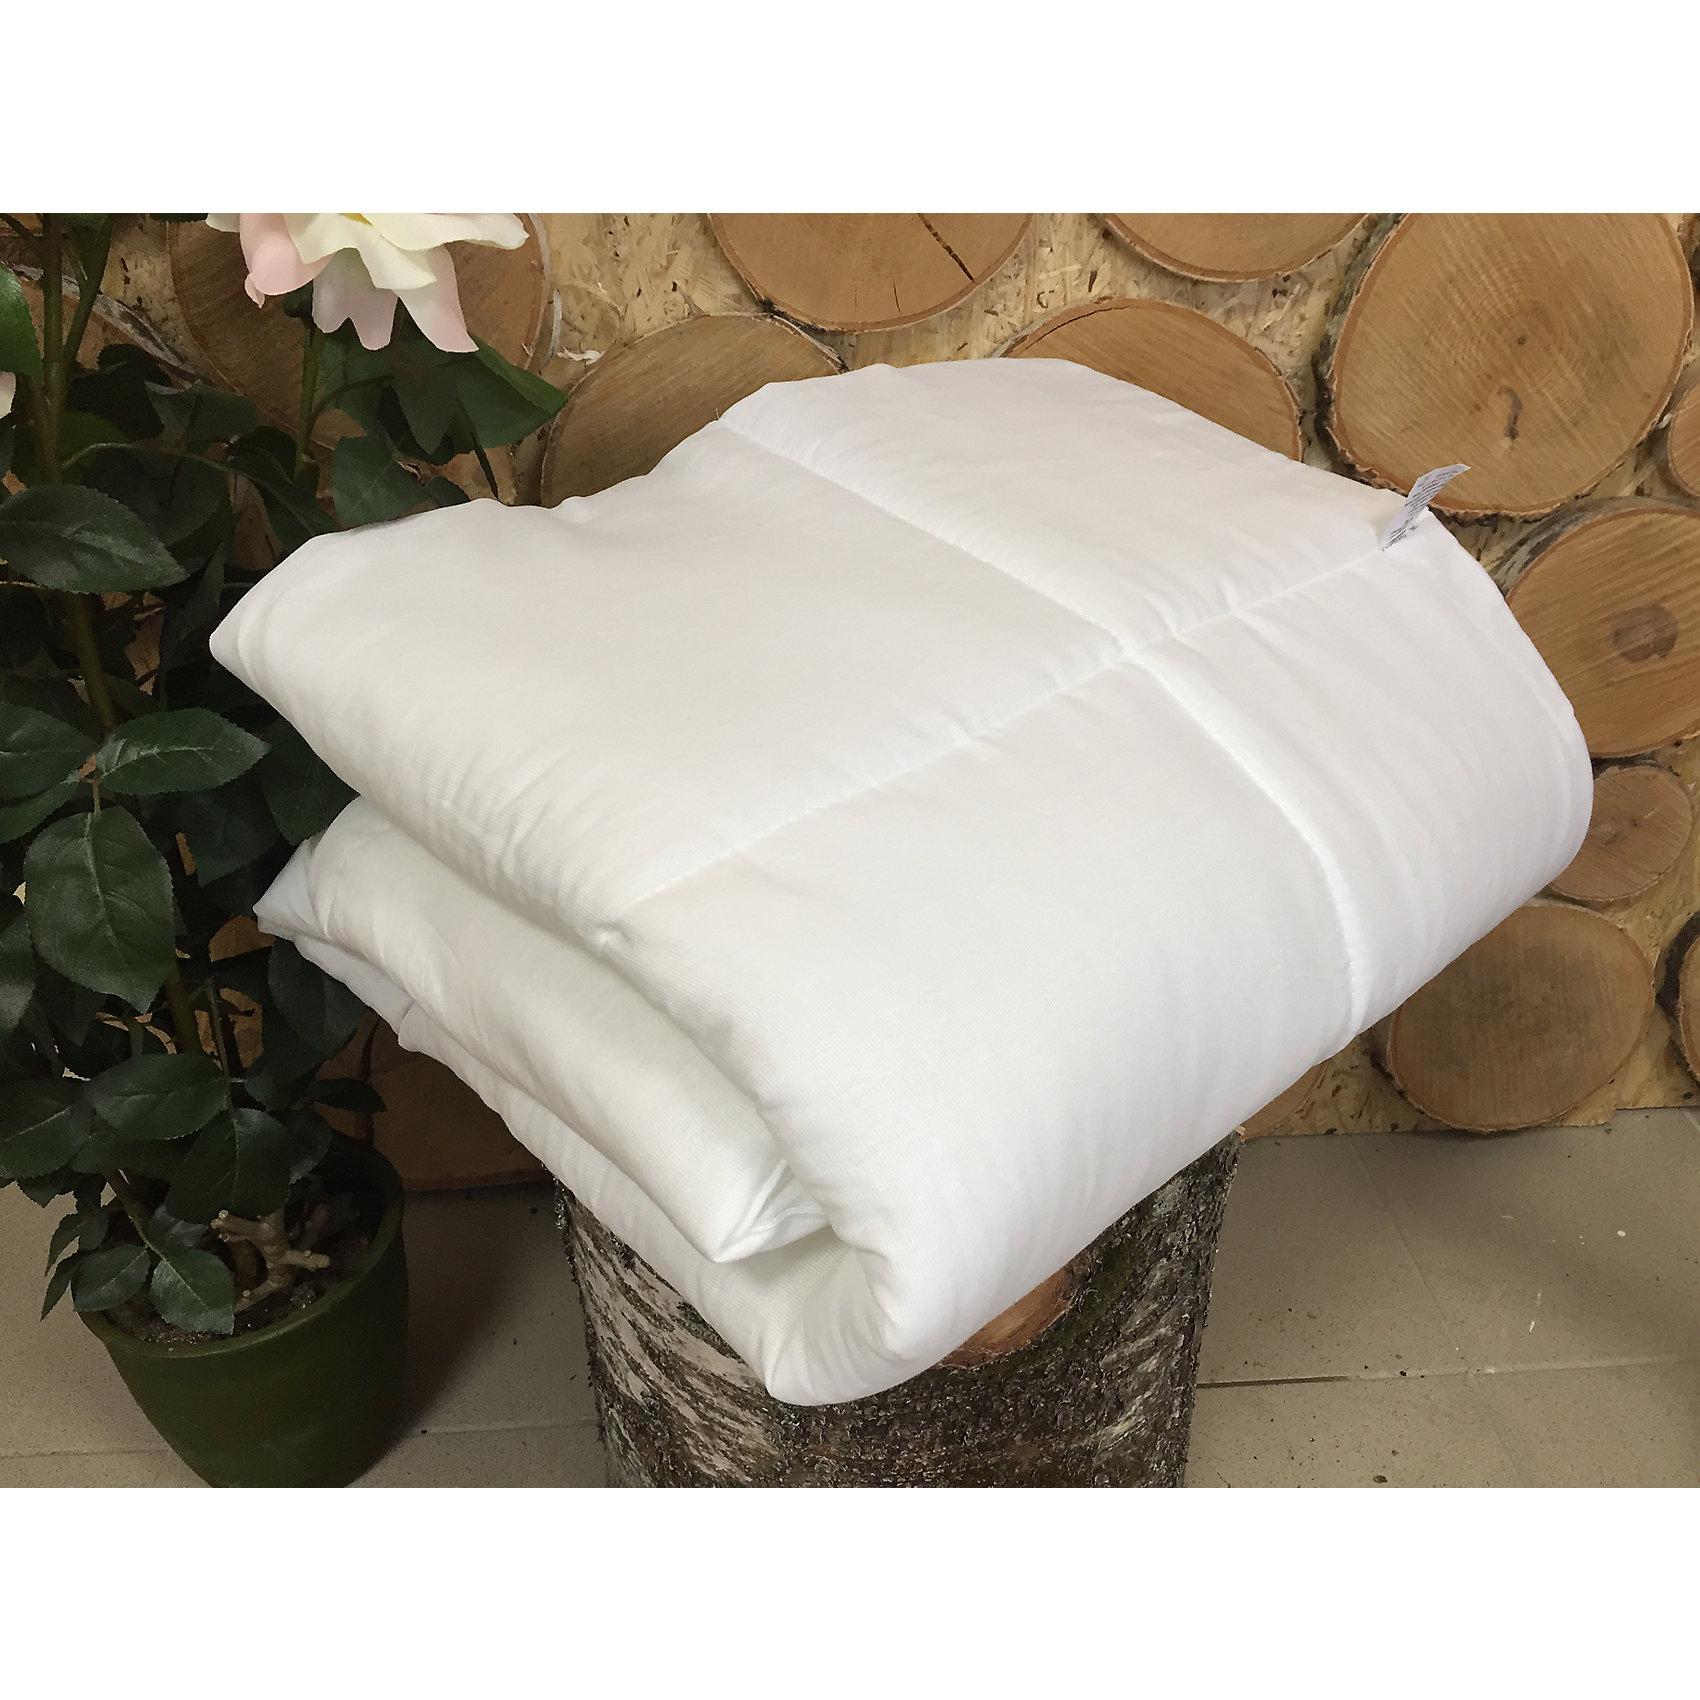 Одеяло белое из ситца,синтепон, р-р110х140;120х120 (110*140)Одеяла, пледы<br>Одеяло белое из ситца. Наполнитель: синтепон.<br><br>Ширина мм: 600<br>Глубина мм: 380<br>Высота мм: 150<br>Вес г: 300<br>Возраст от месяцев: 0<br>Возраст до месяцев: 6<br>Пол: Унисекс<br>Возраст: Детский<br>SKU: 5465320